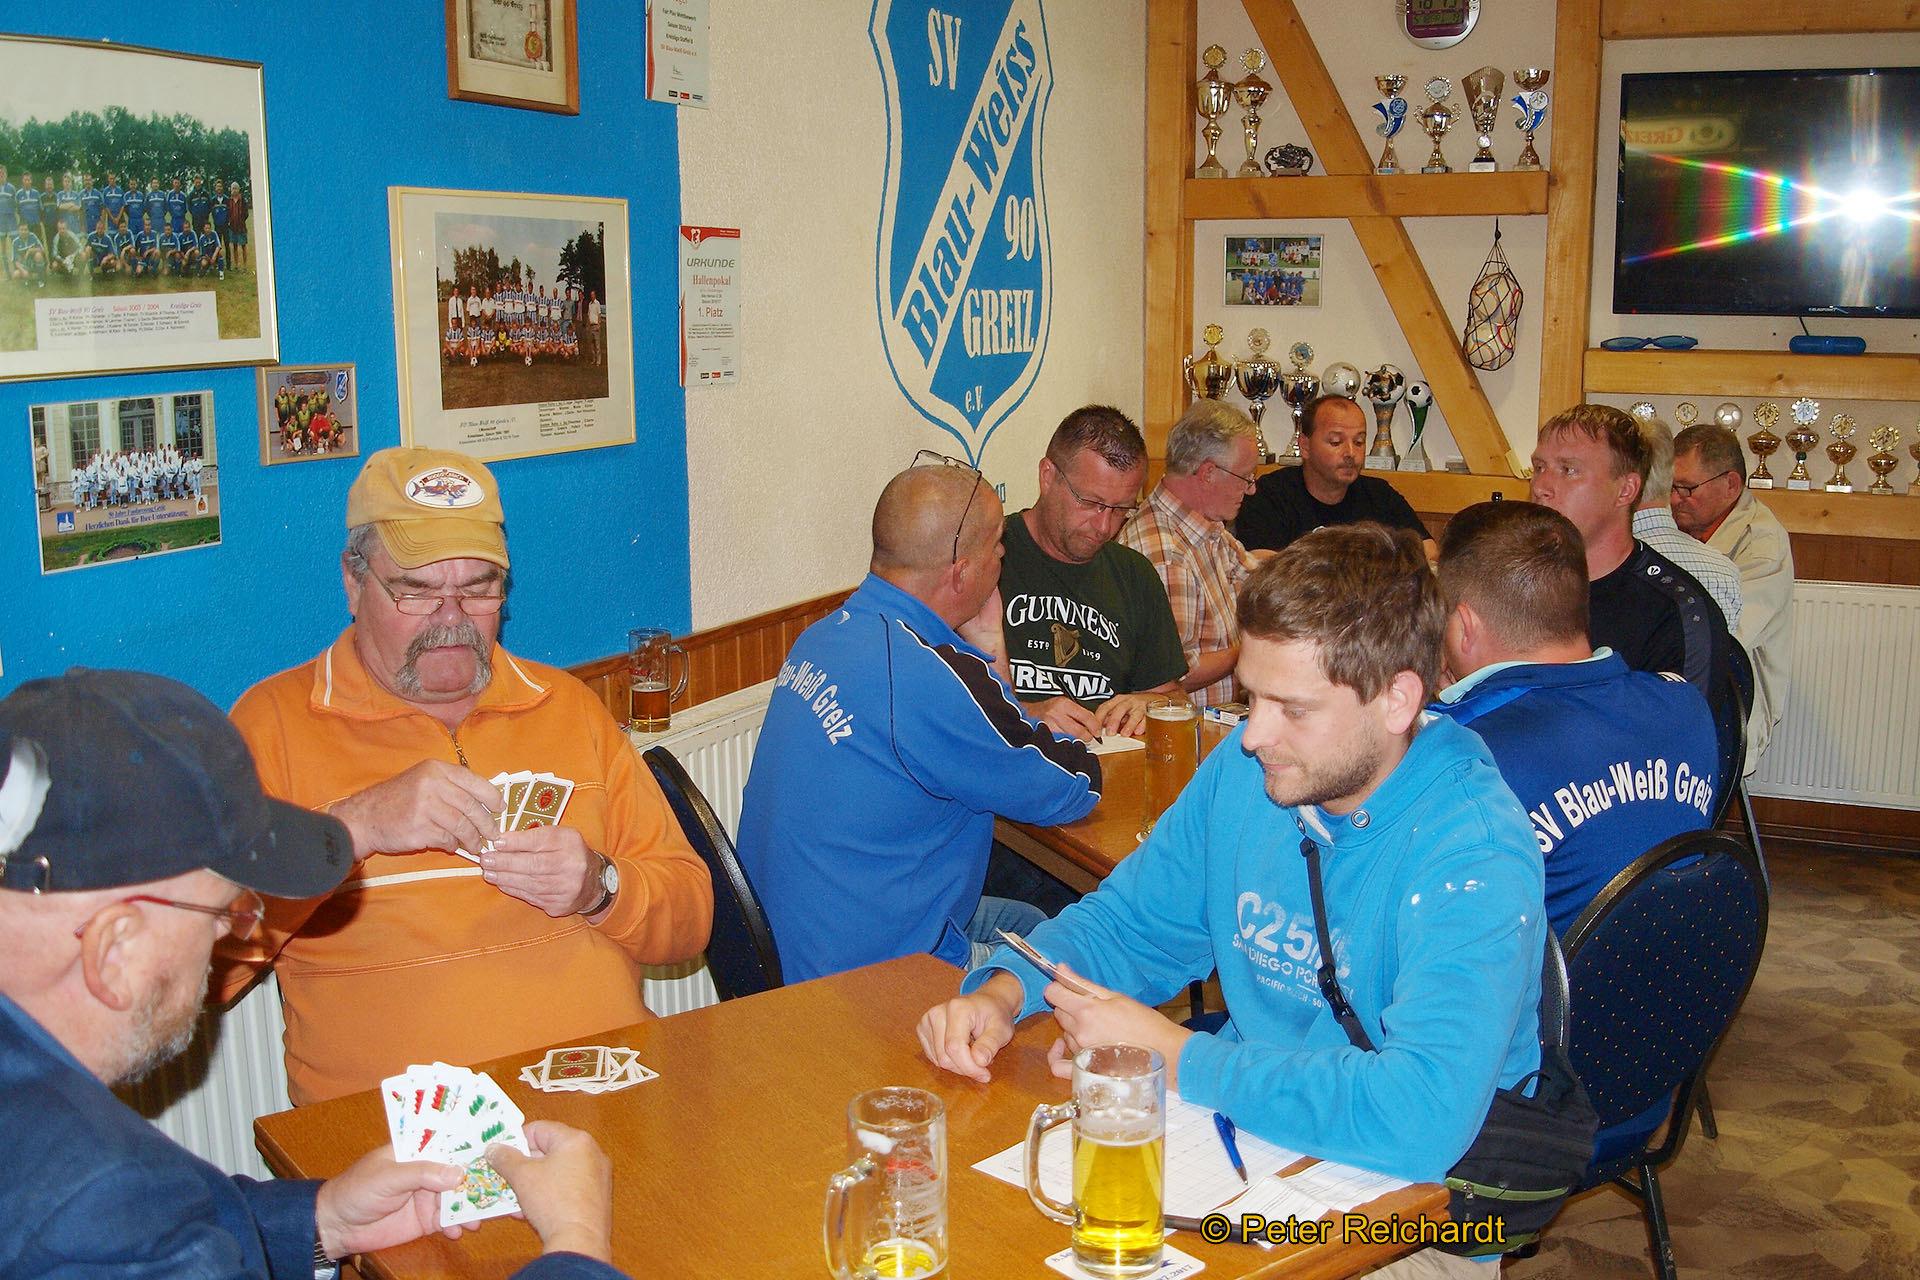 Frühjahrsskatturnier 2018 des SV Blau-Weiß 90 Greiz fand großen Anklang